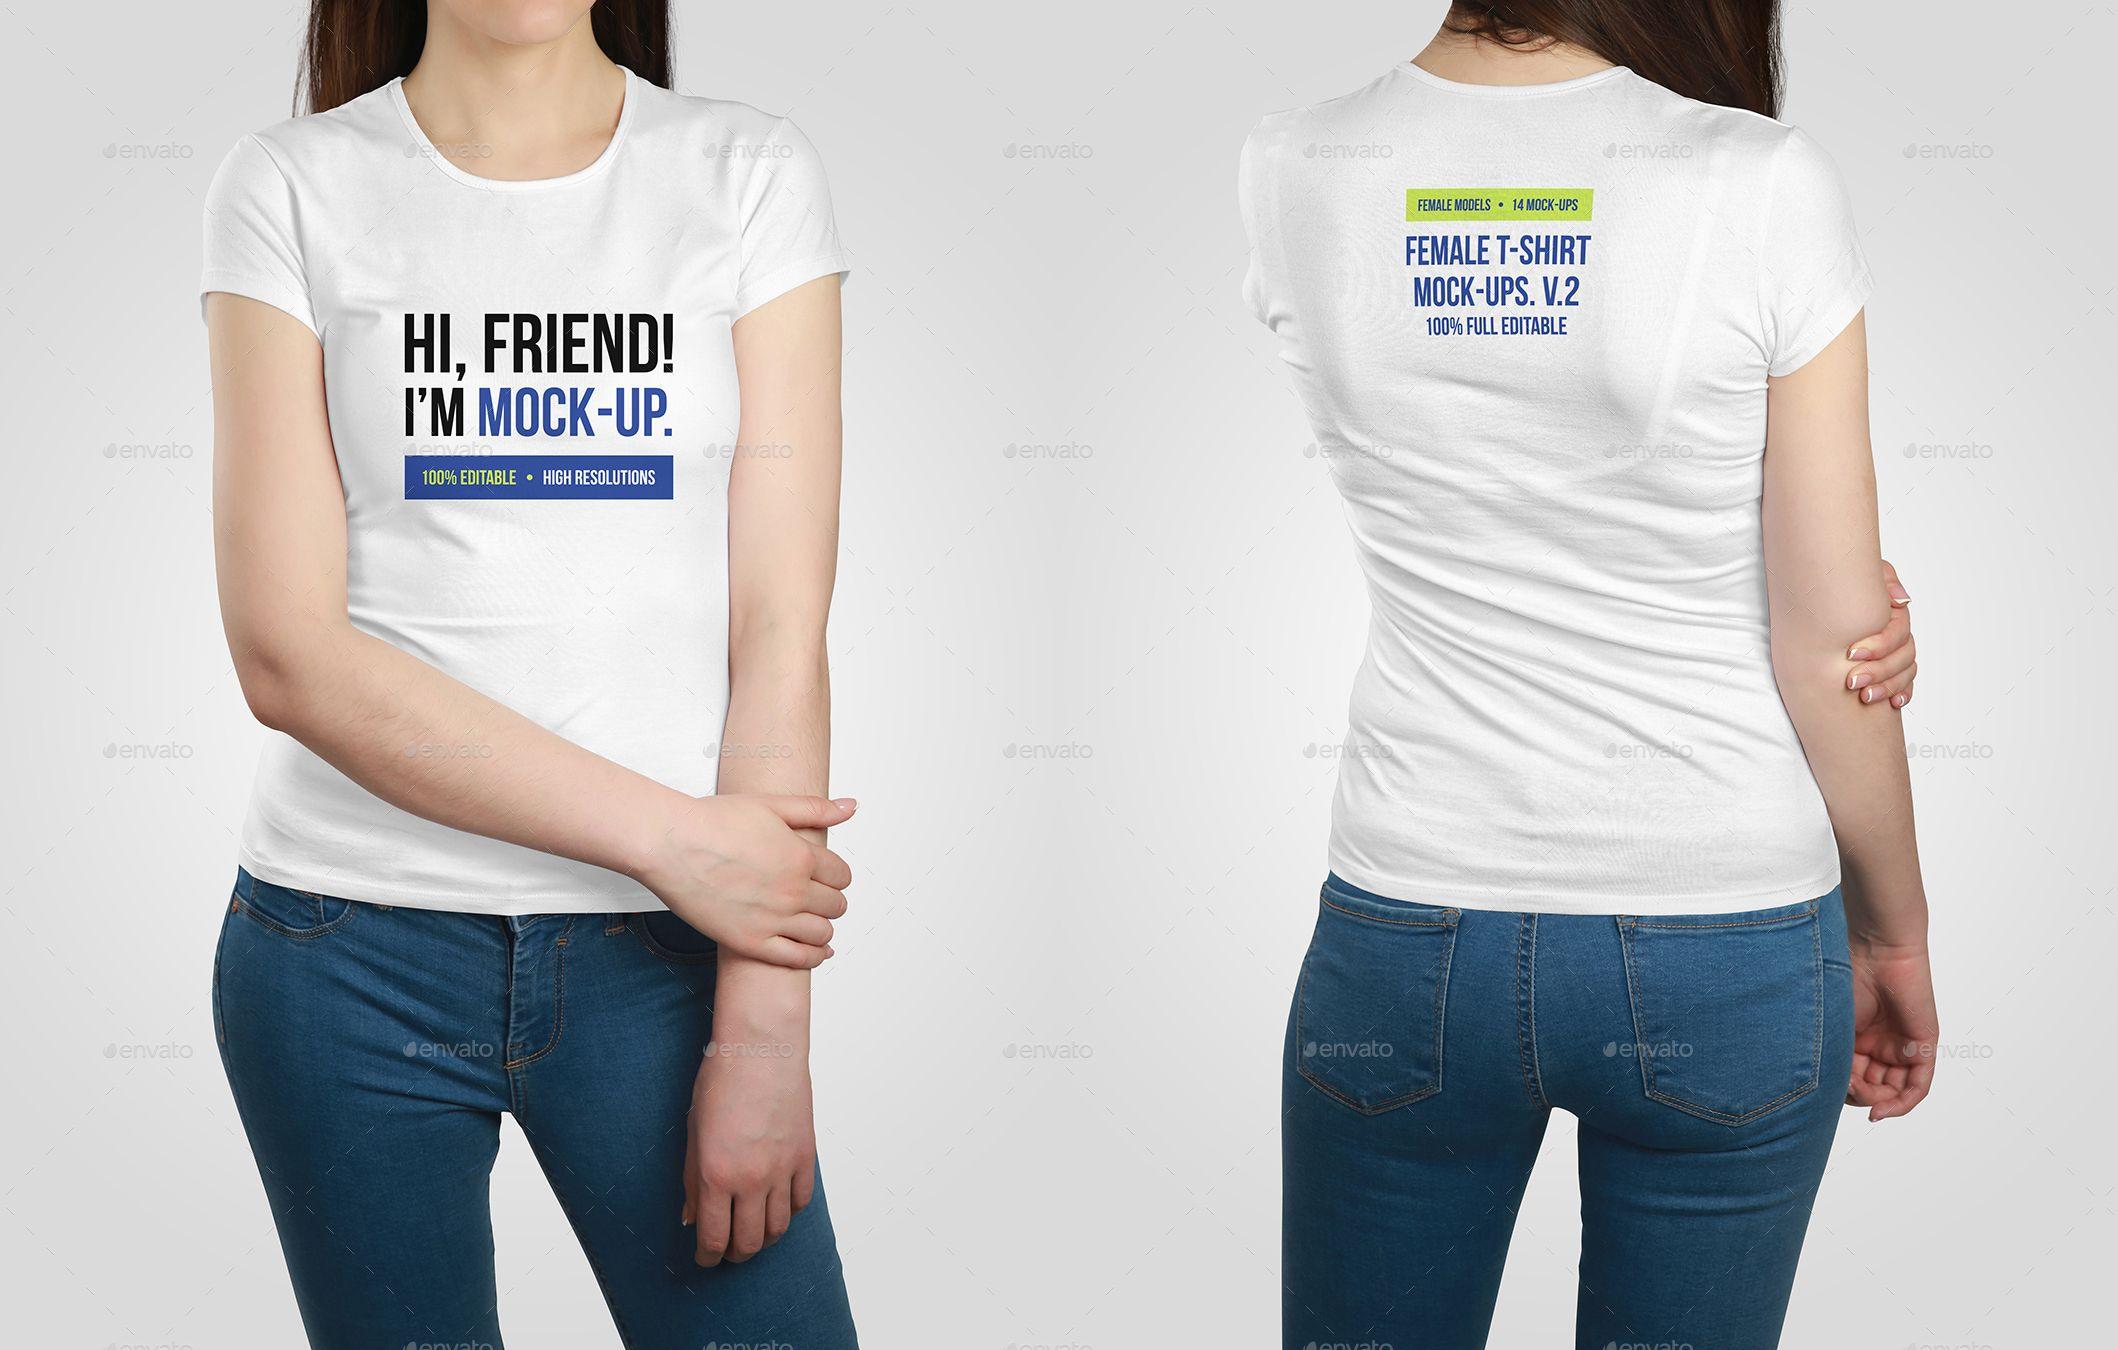 Download Female T Shirt Mockups Vol 2 Shirt Mockup Shirts T Shirts For Women